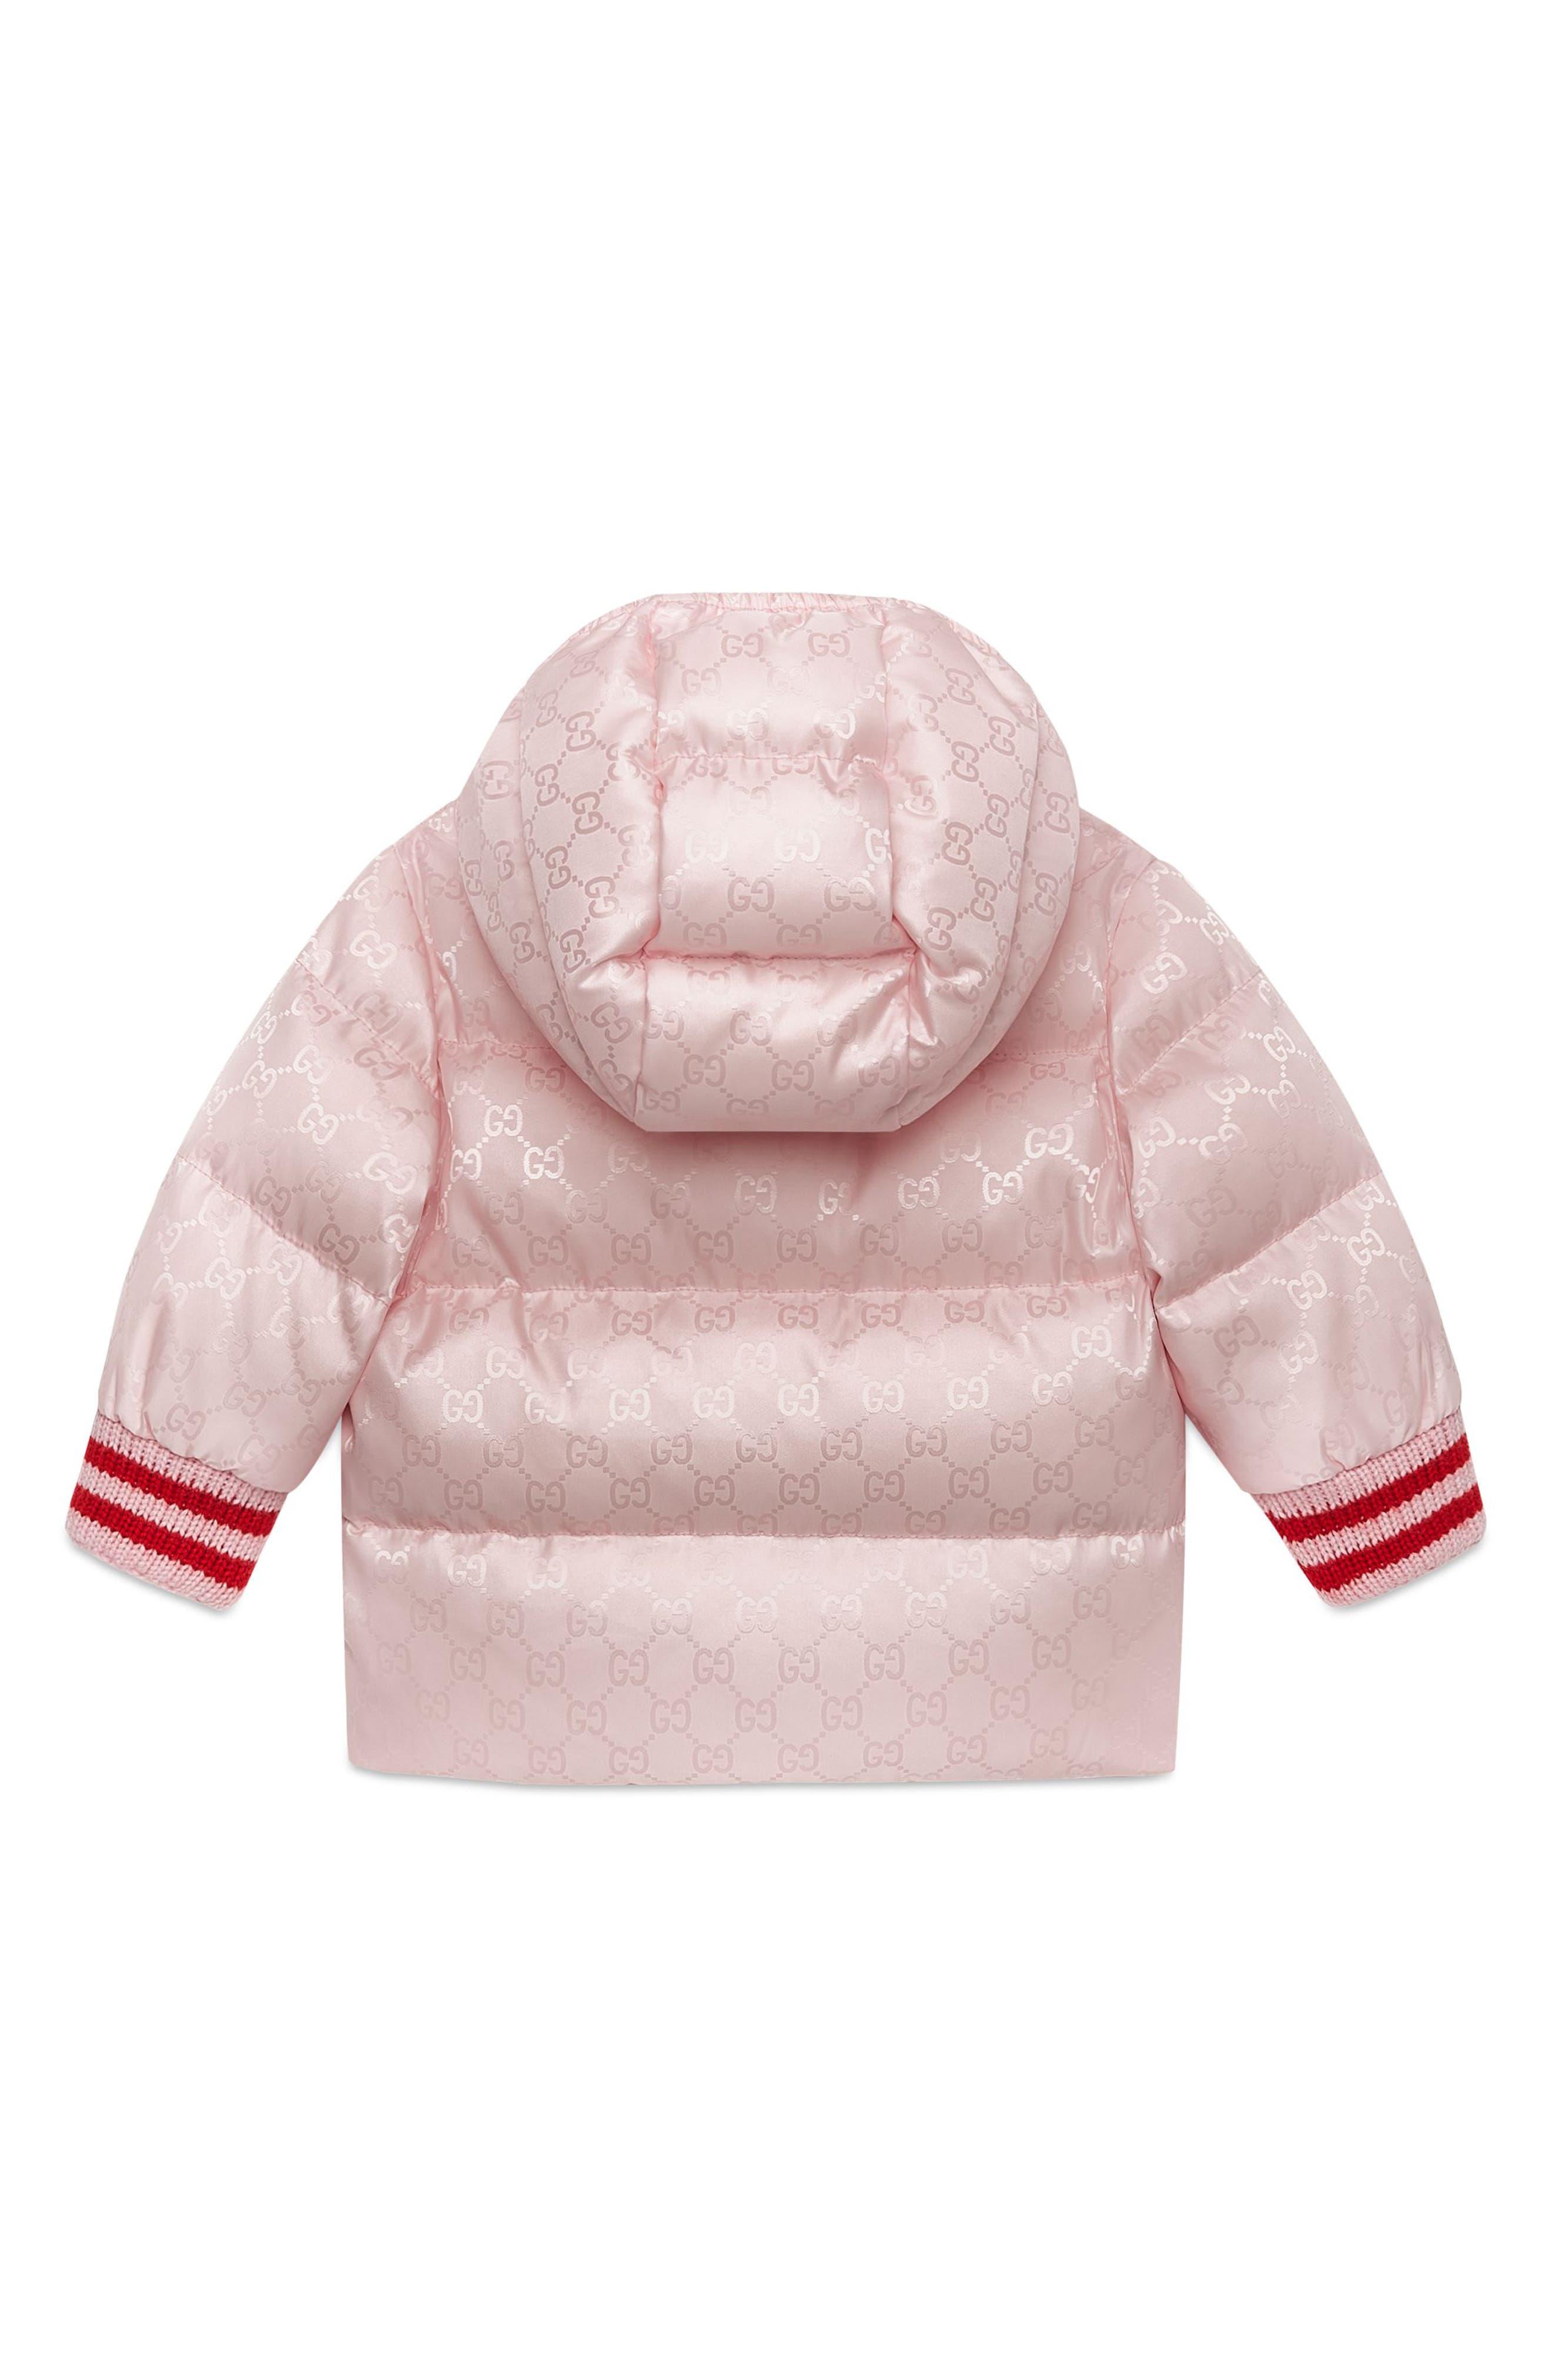 Reversible GG Jacquard Water-Resistant Down Jacket,                             Alternate thumbnail 2, color,                             667